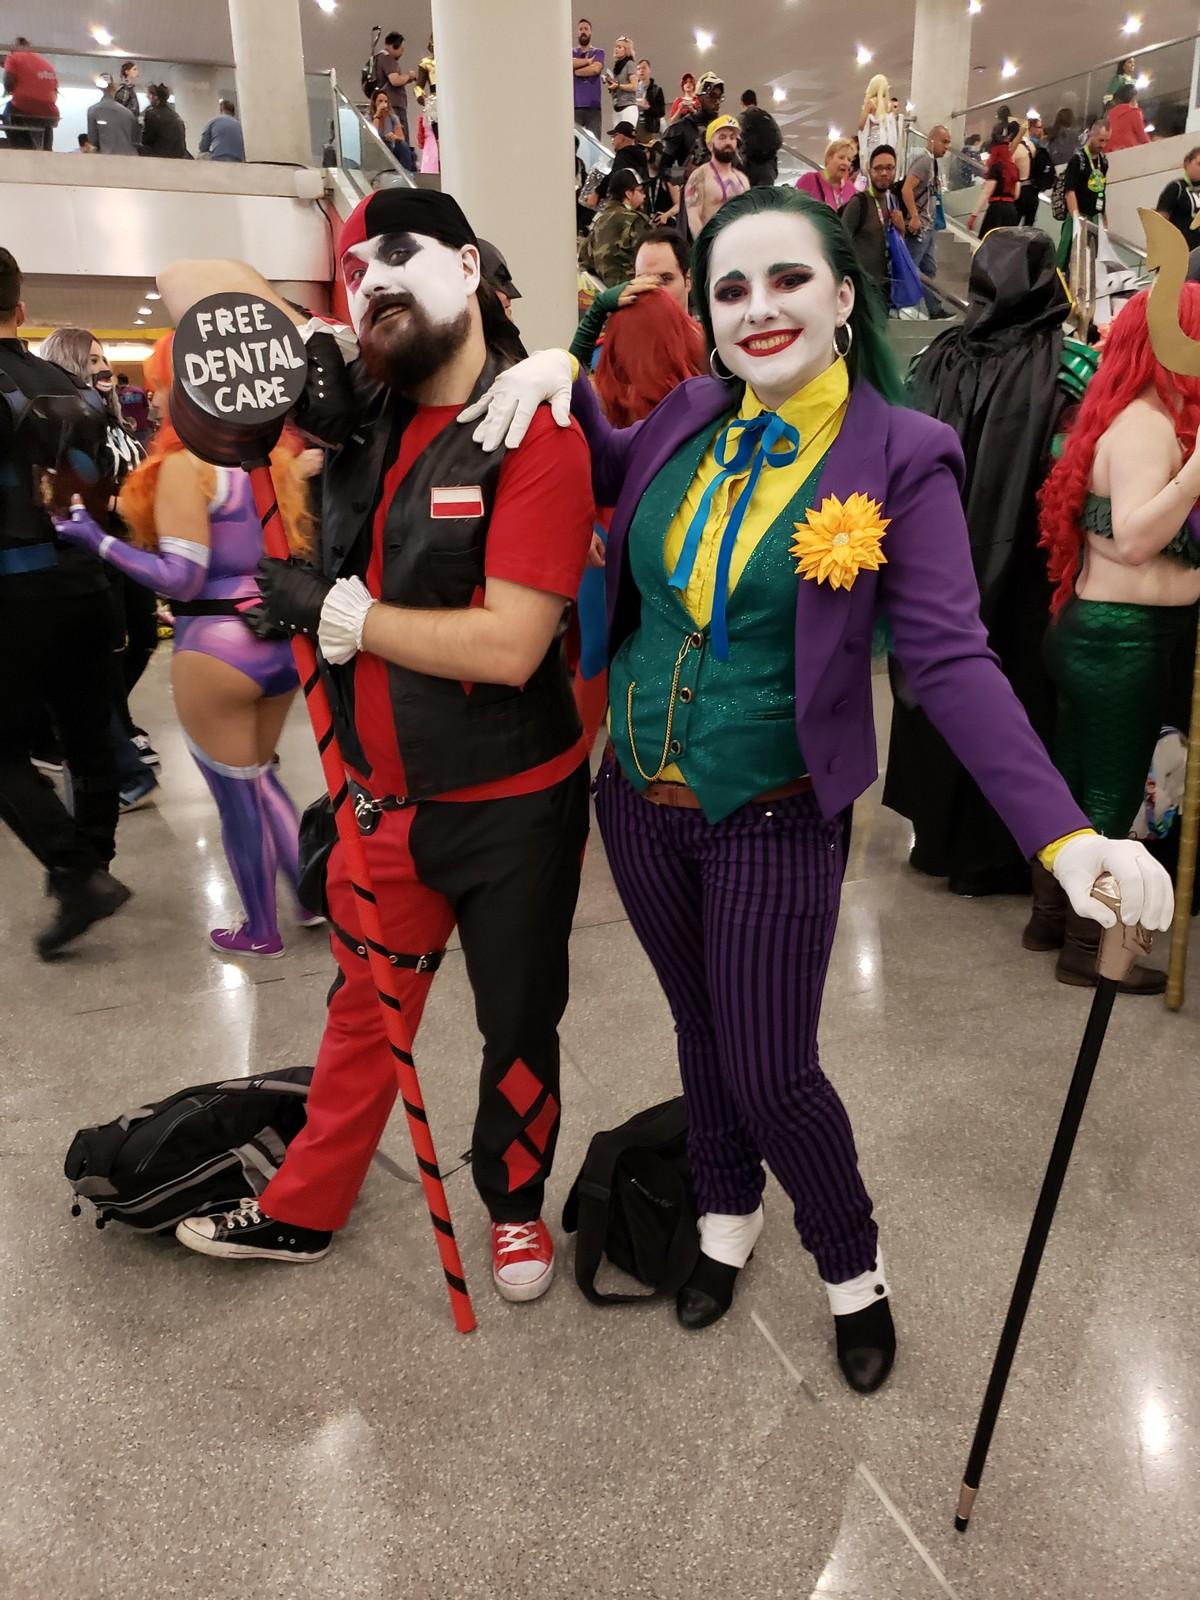 Креативные косплеи с Comic Con-2019 в Нью-Йорке